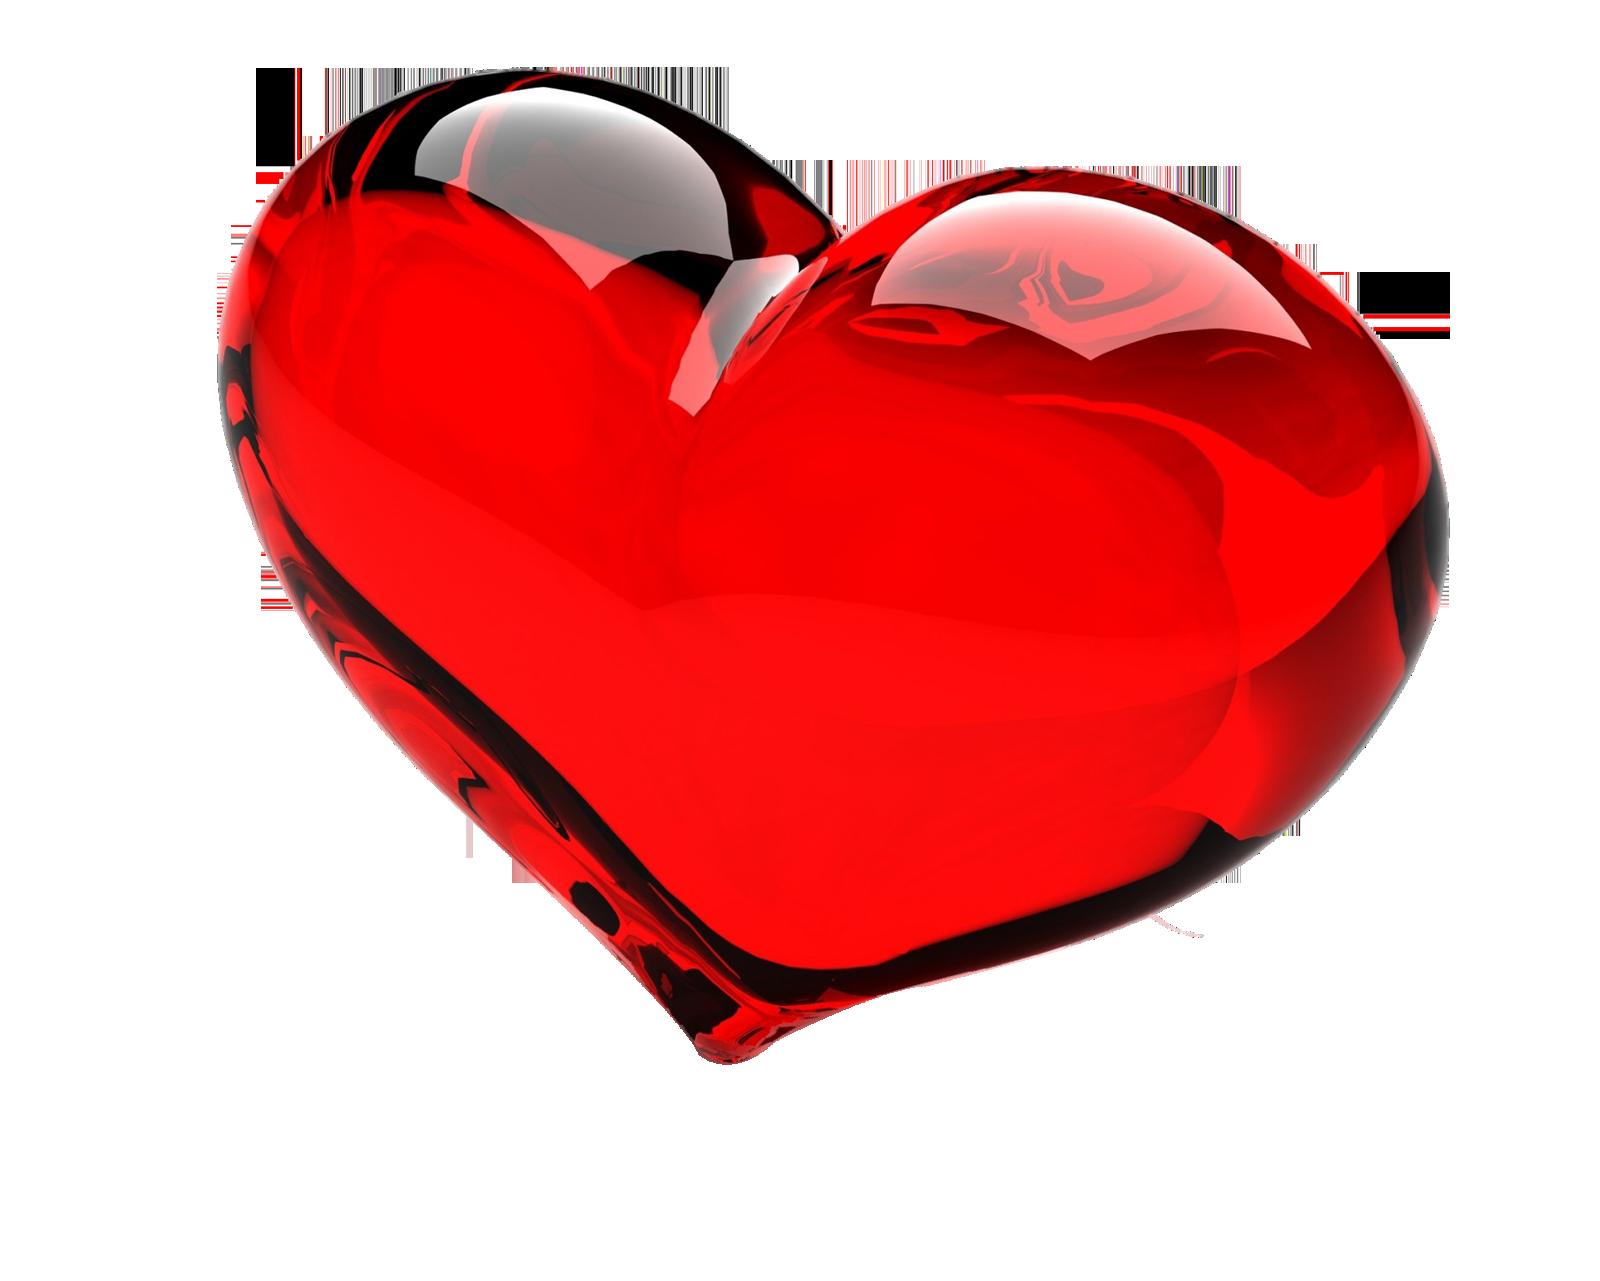 Png x love transparent. Raindrop clipart heart